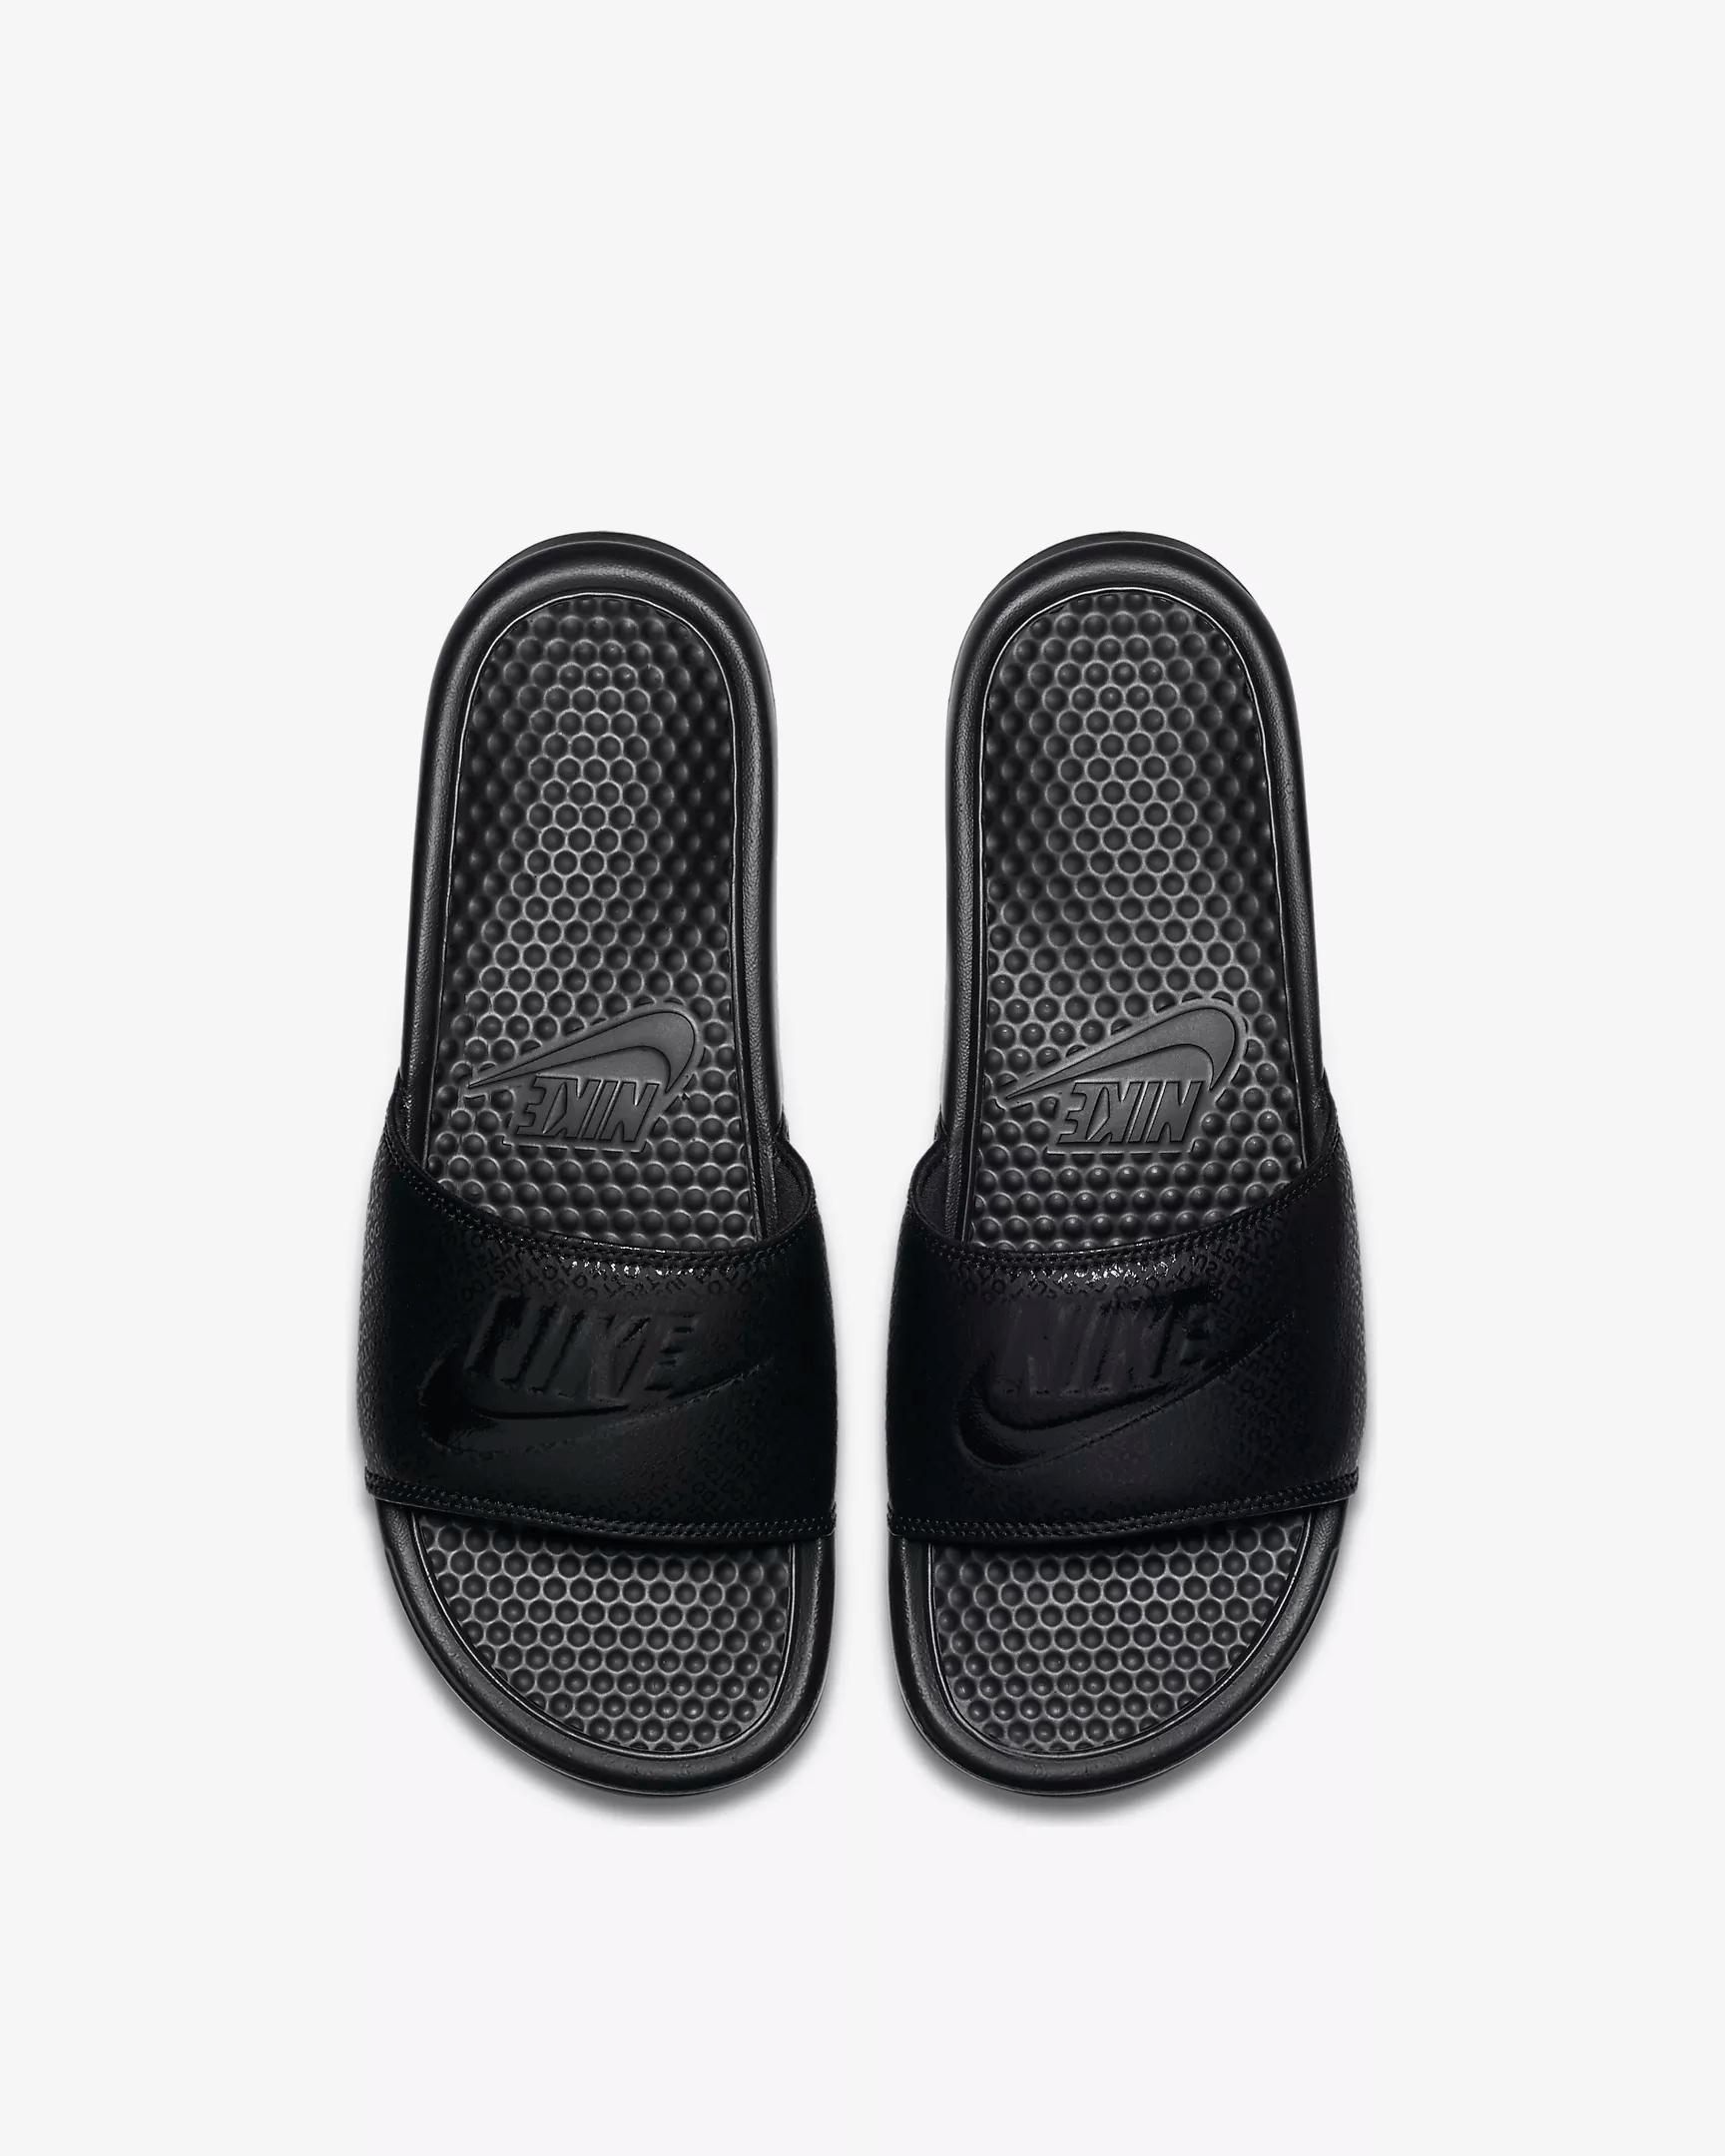 Nike Benassi mens Slides Black